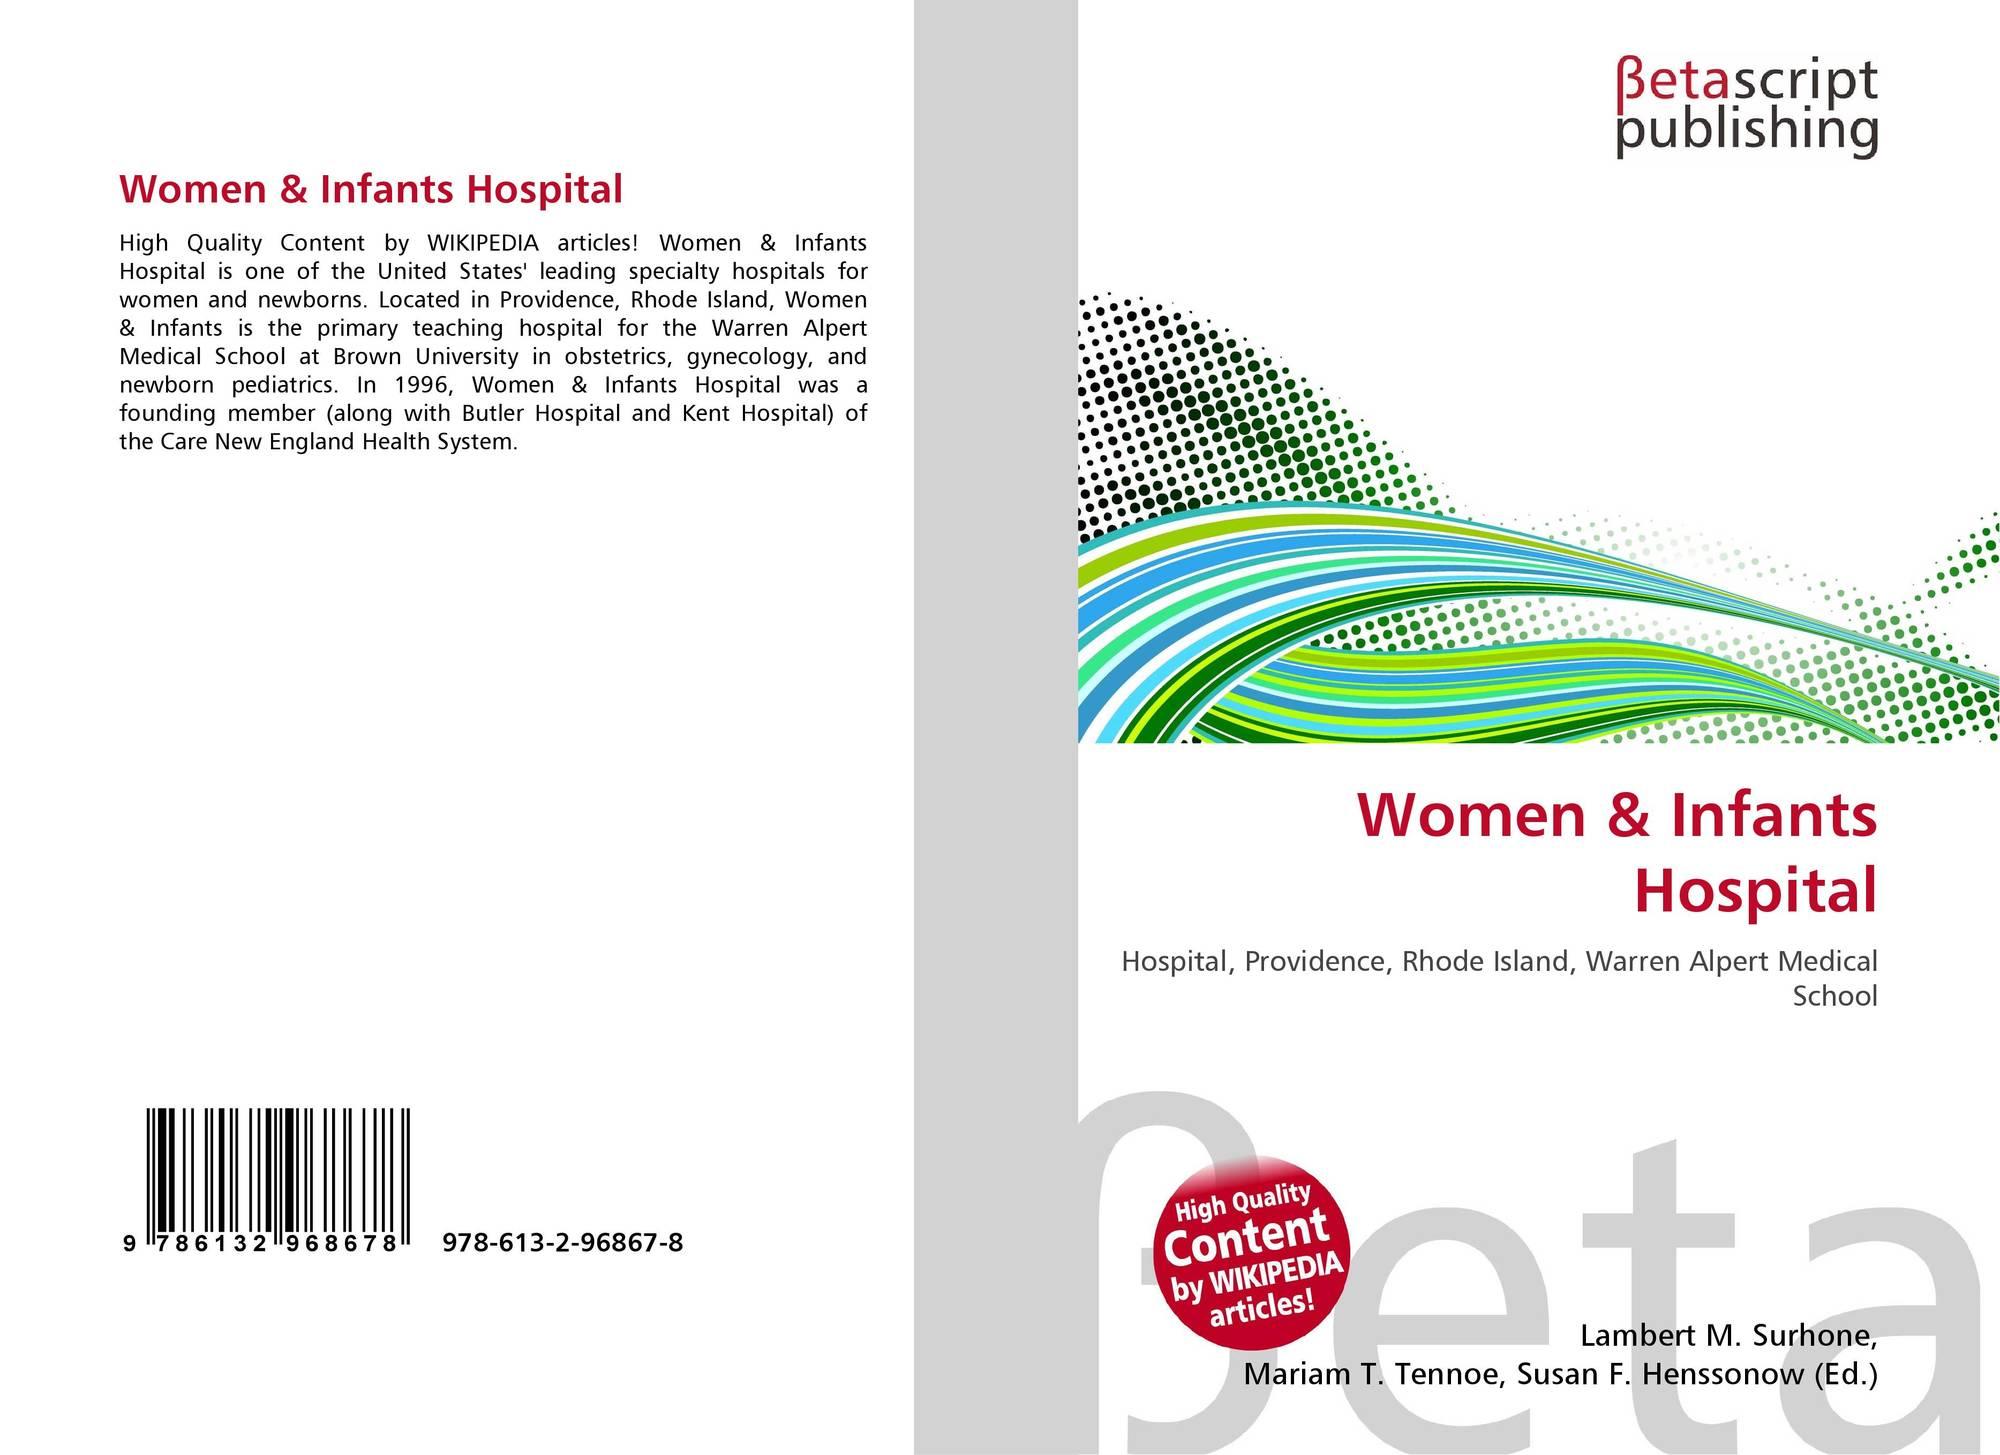 Women & Infants Hospital, 978-613-2-96867-8, 6132968679